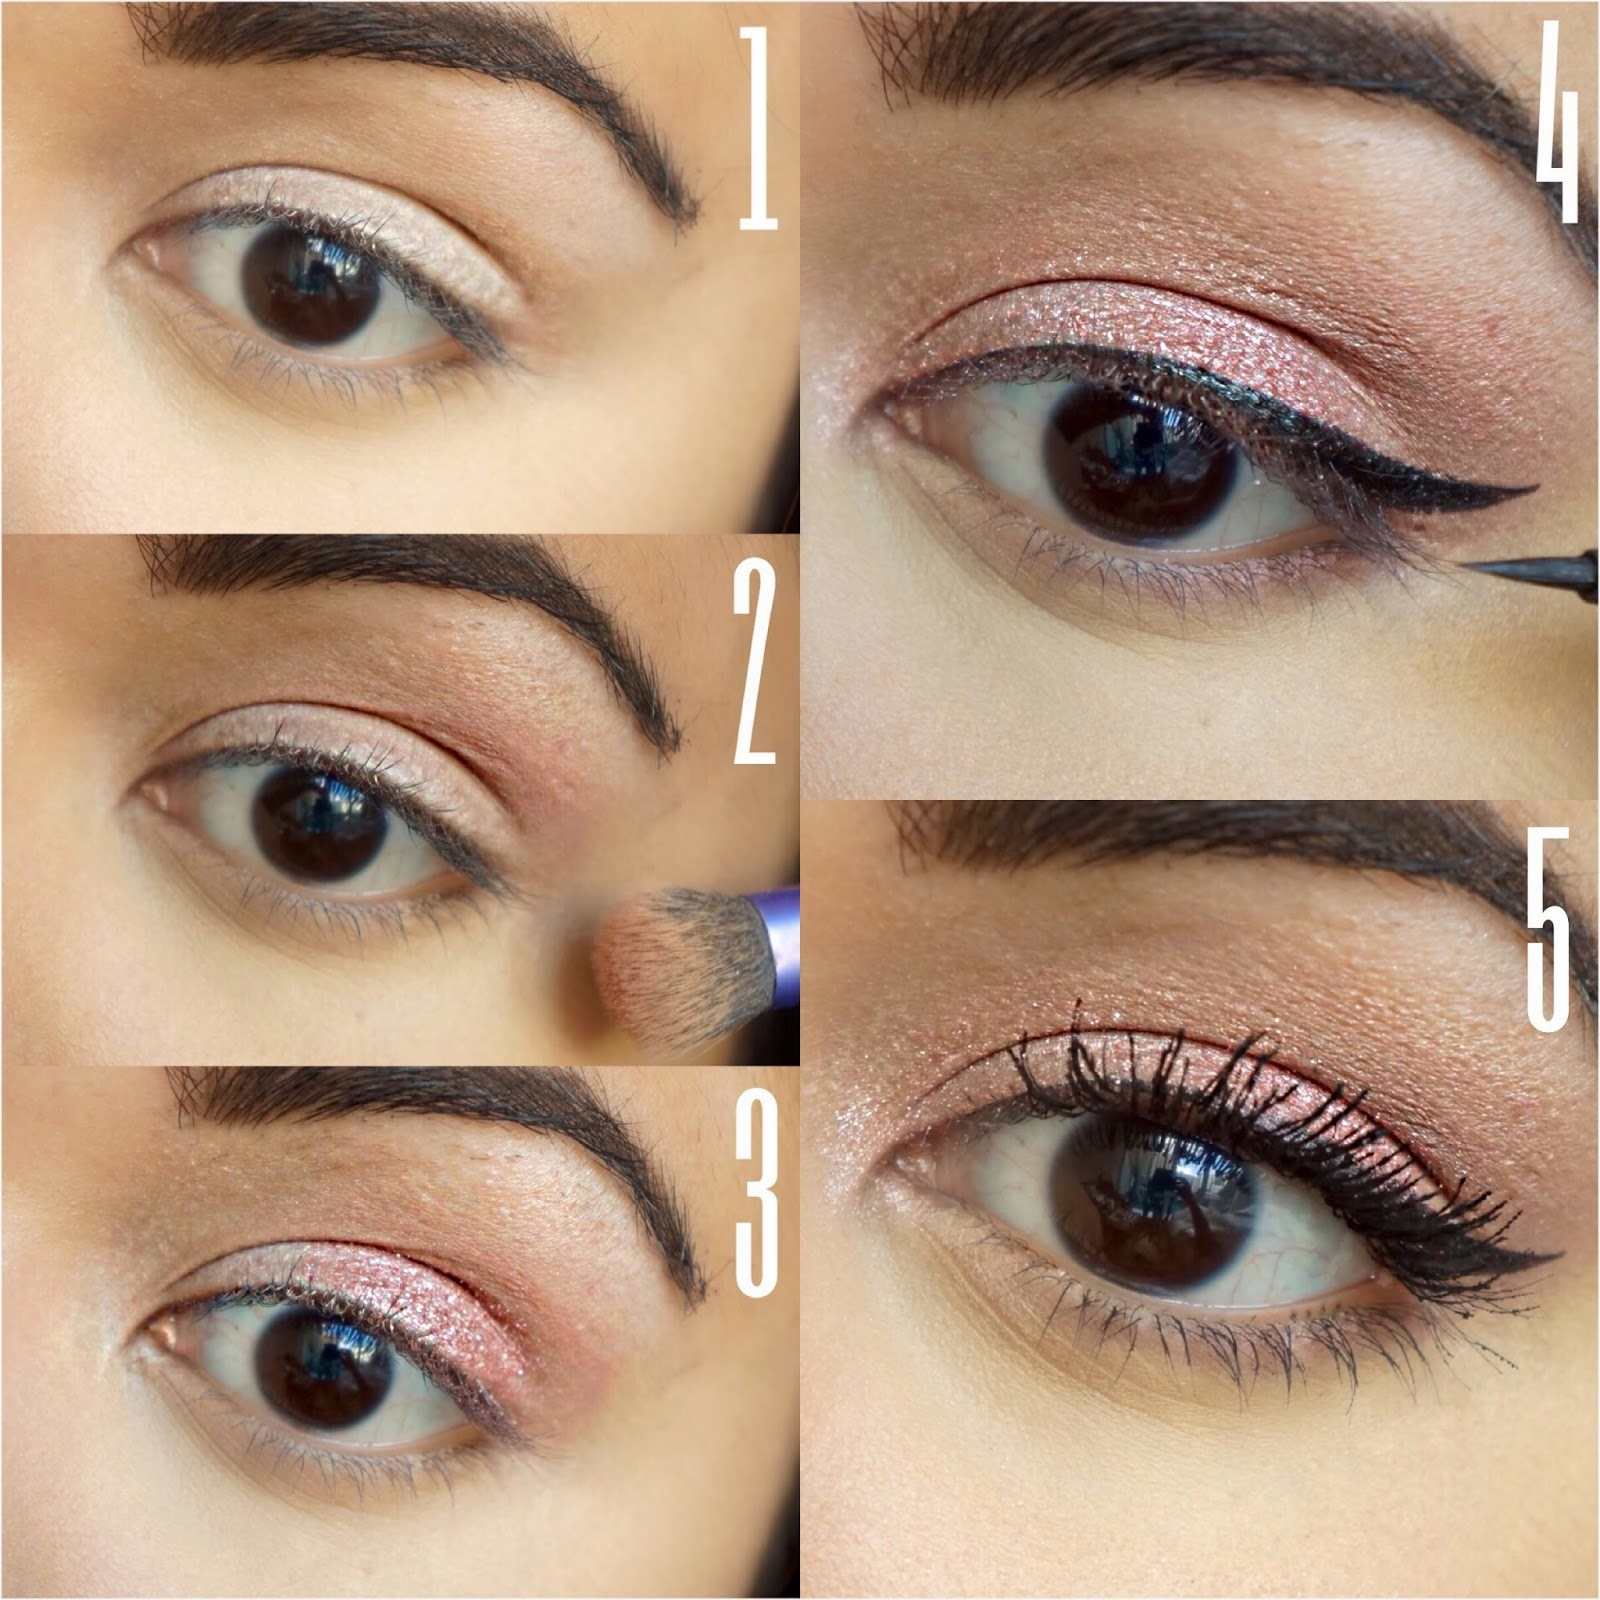 Simple Eye Makeup With Pictures - Mugeek Vidalondon